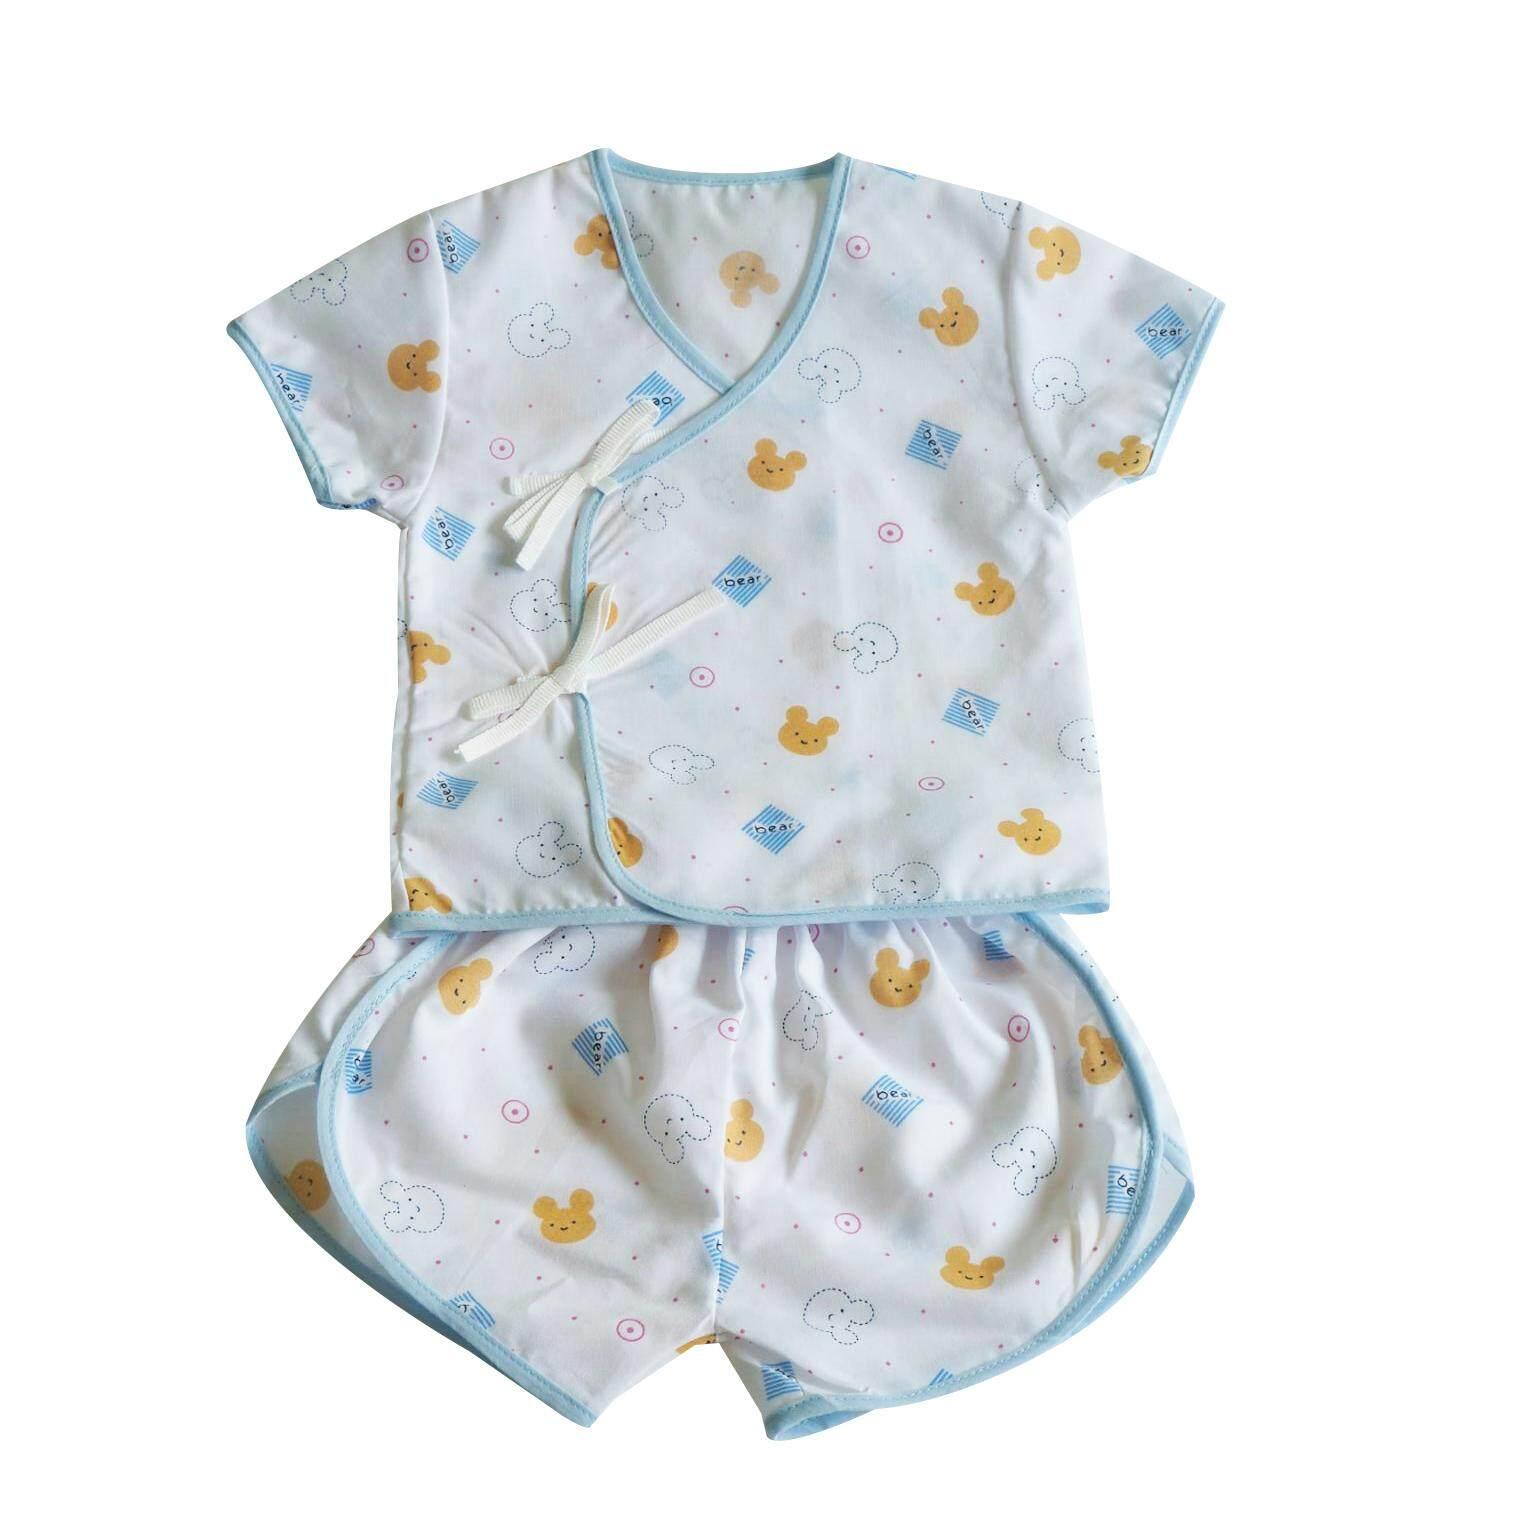 Natty Punn ชุดเสื้อผ้าป่านแบบผูกหน้า พิมพ์ลายกระจาย 0-3 เดือน รุ่น Lucky By Nattypunn.